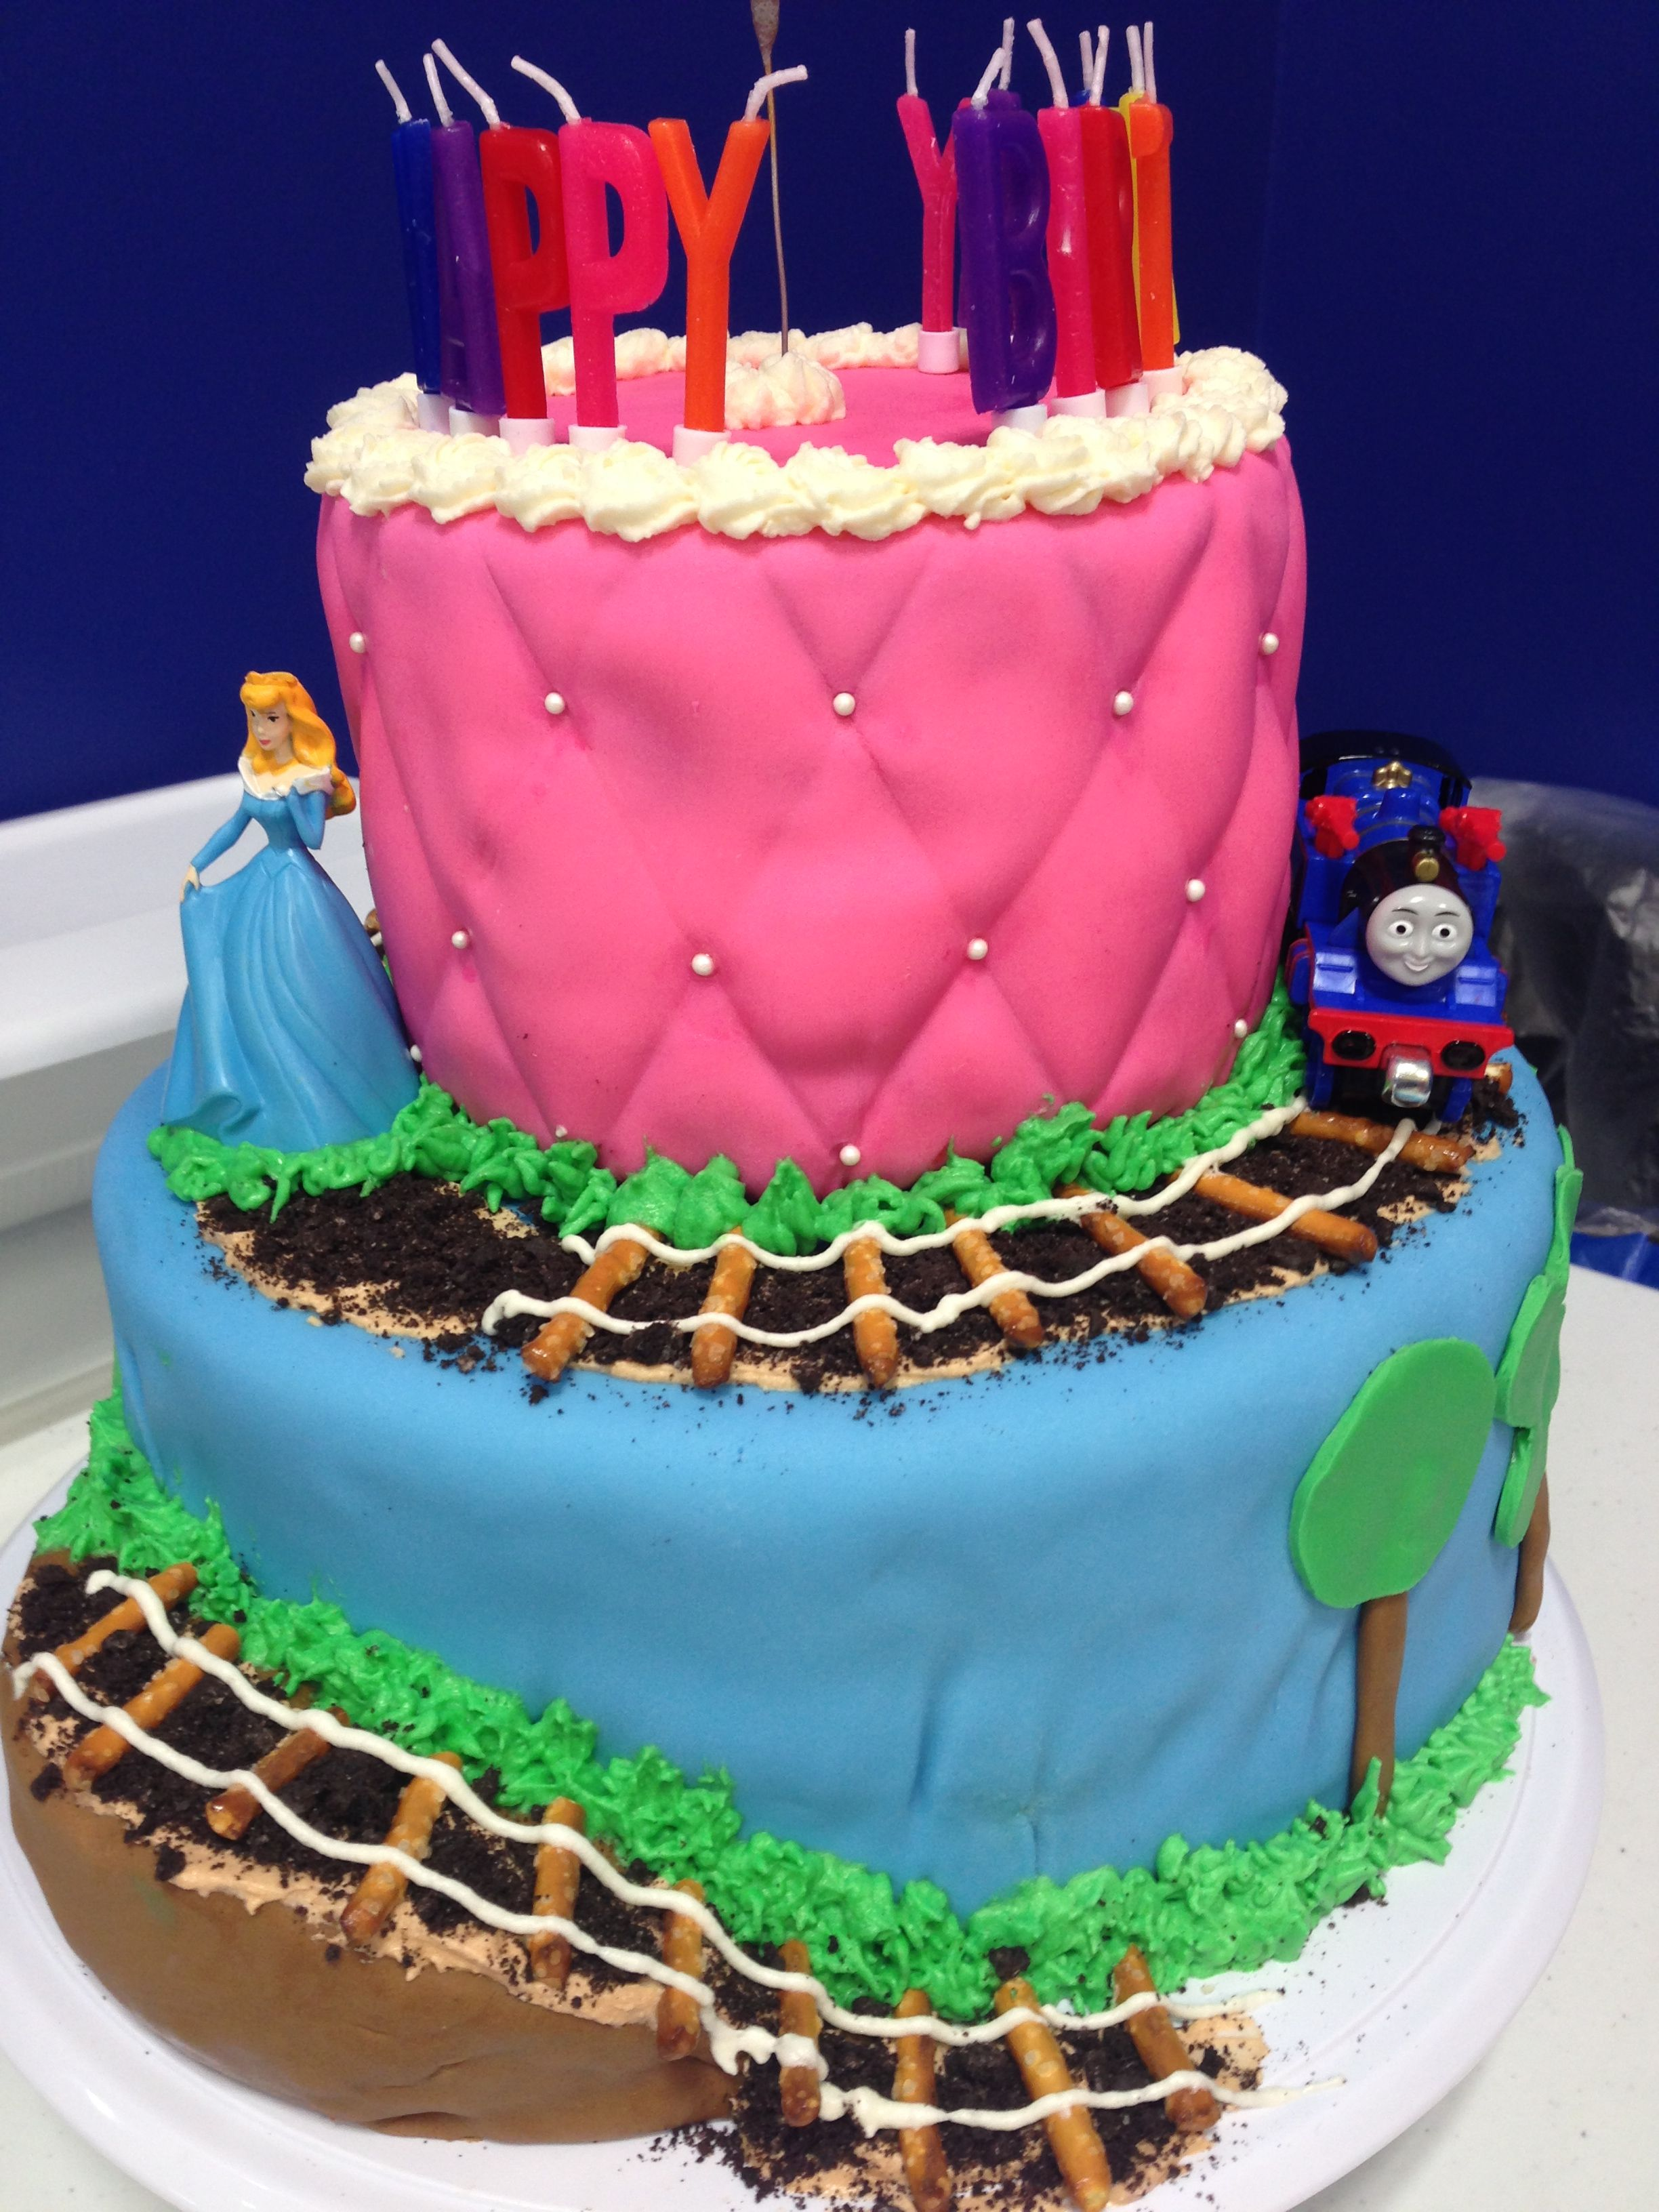 Boy Girl Combined Birthday Cake Www Facebook Com Acupcakelife1